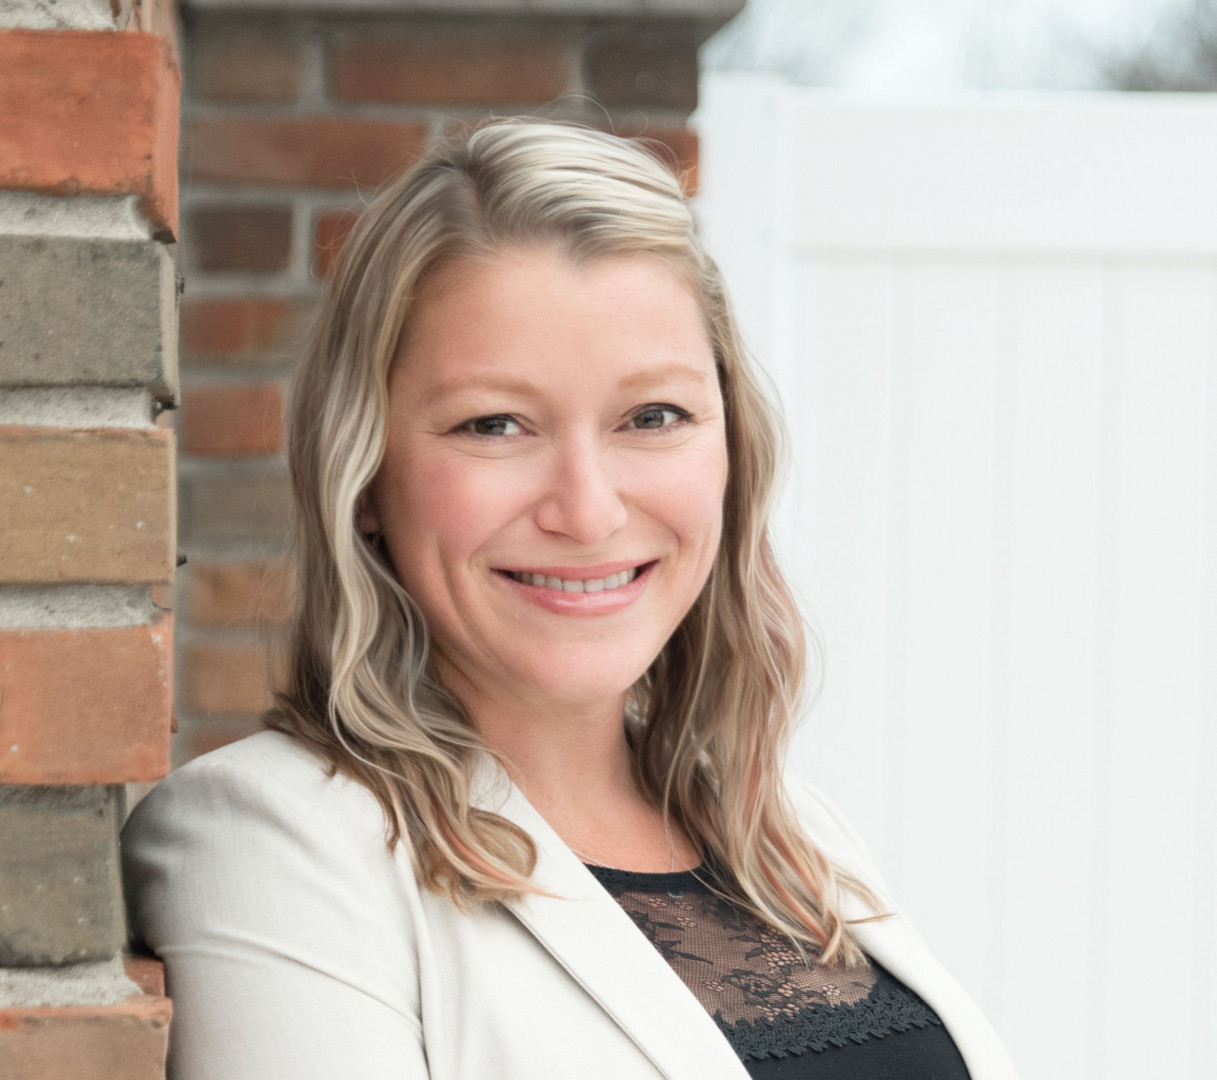 Heather Solcz